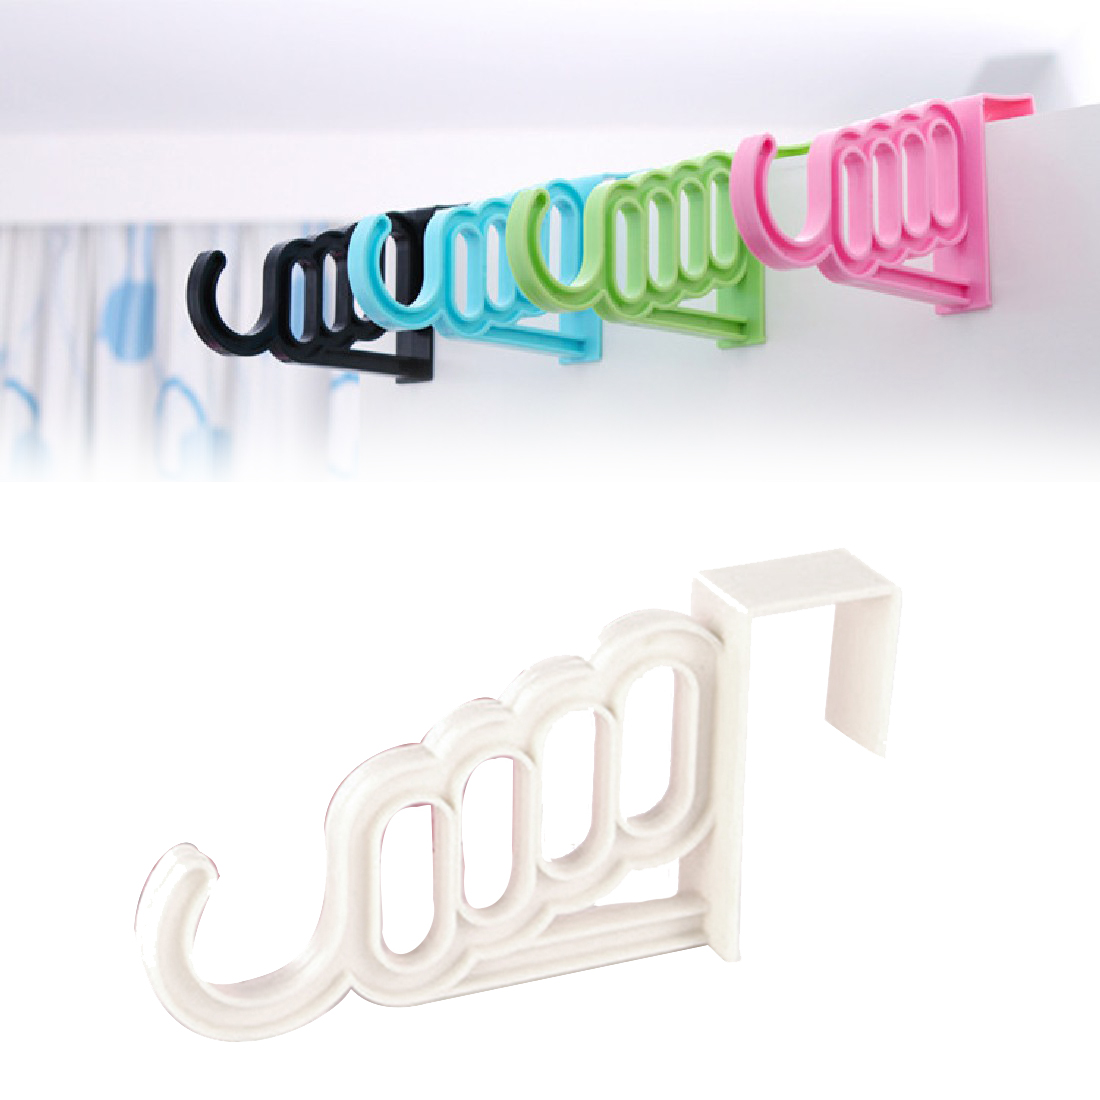 ABS Plastic Candy Color Multifunctional Durable Bathroom Kitchen Door Hanger Hook For Clothes Towel Bag